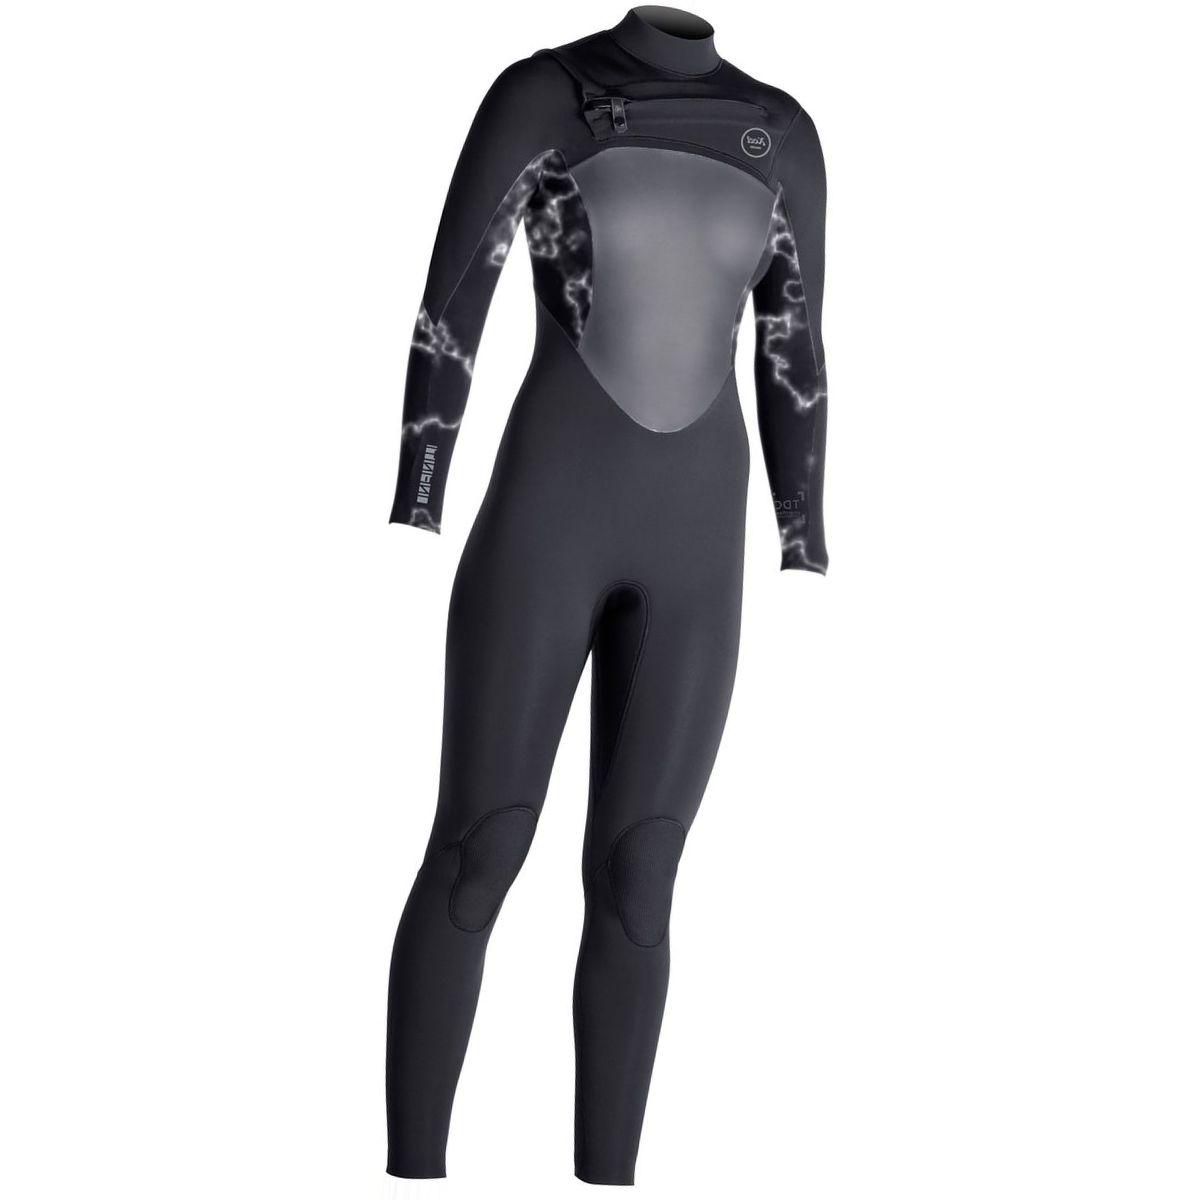 XCEL 3/2 Infiniti TDC Chest-Zip Full Wetsuit - Women's